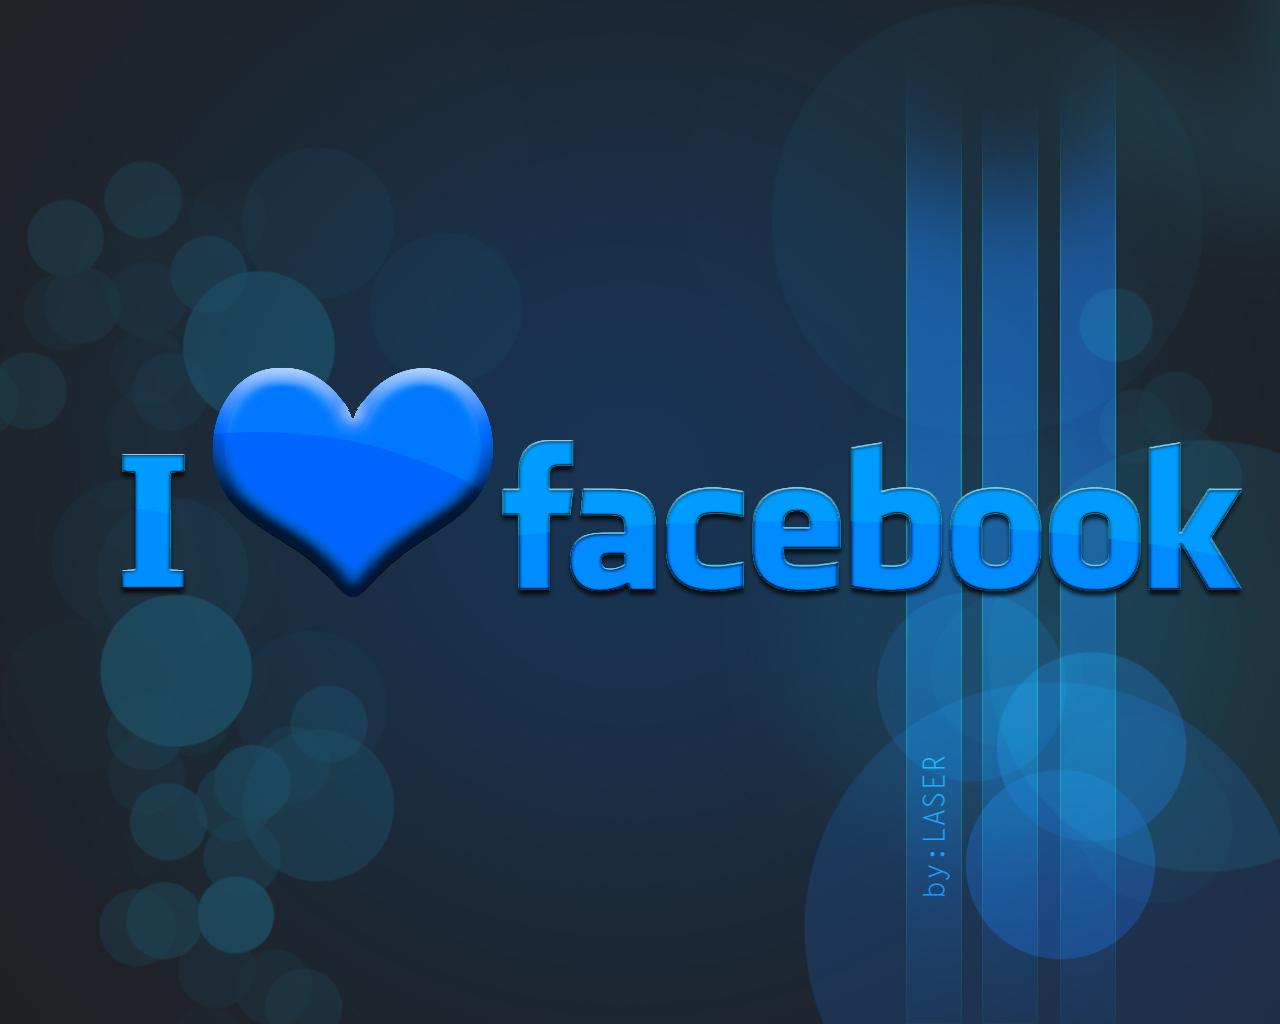 http://2.bp.blogspot.com/-z9nJ8PCX_rc/TiF8t2qNNrI/AAAAAAAABxs/3mCBQN1WeGw/s1600/facebook_wallpaper.jpg